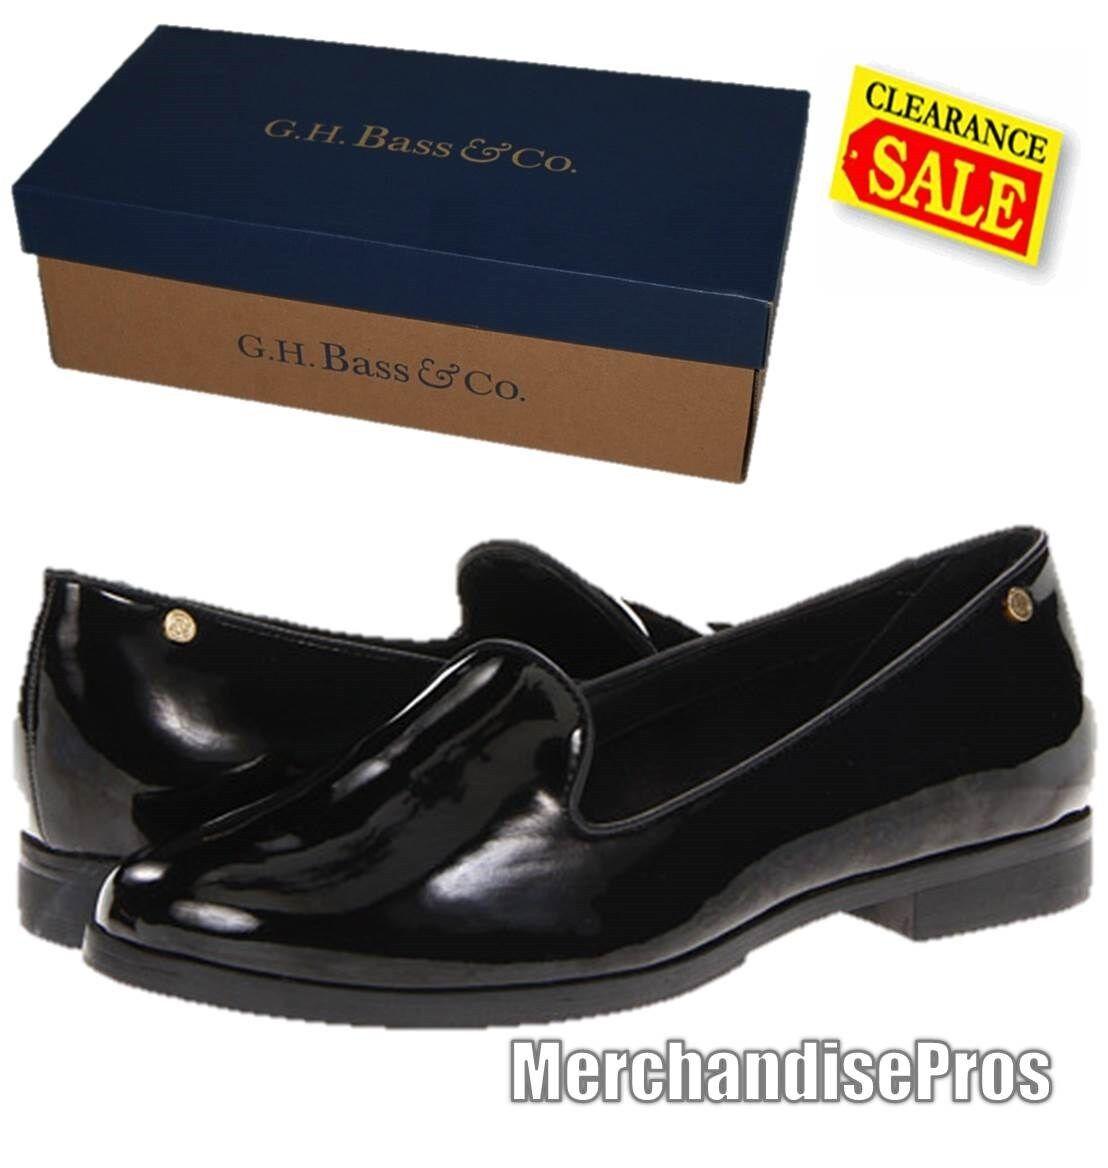 WOMEN'S BASS LUCILLE SLIP-ON BLACK LOAFERS Schuhe 8M & GOLD TOE SOCKS BUNDLE NEU